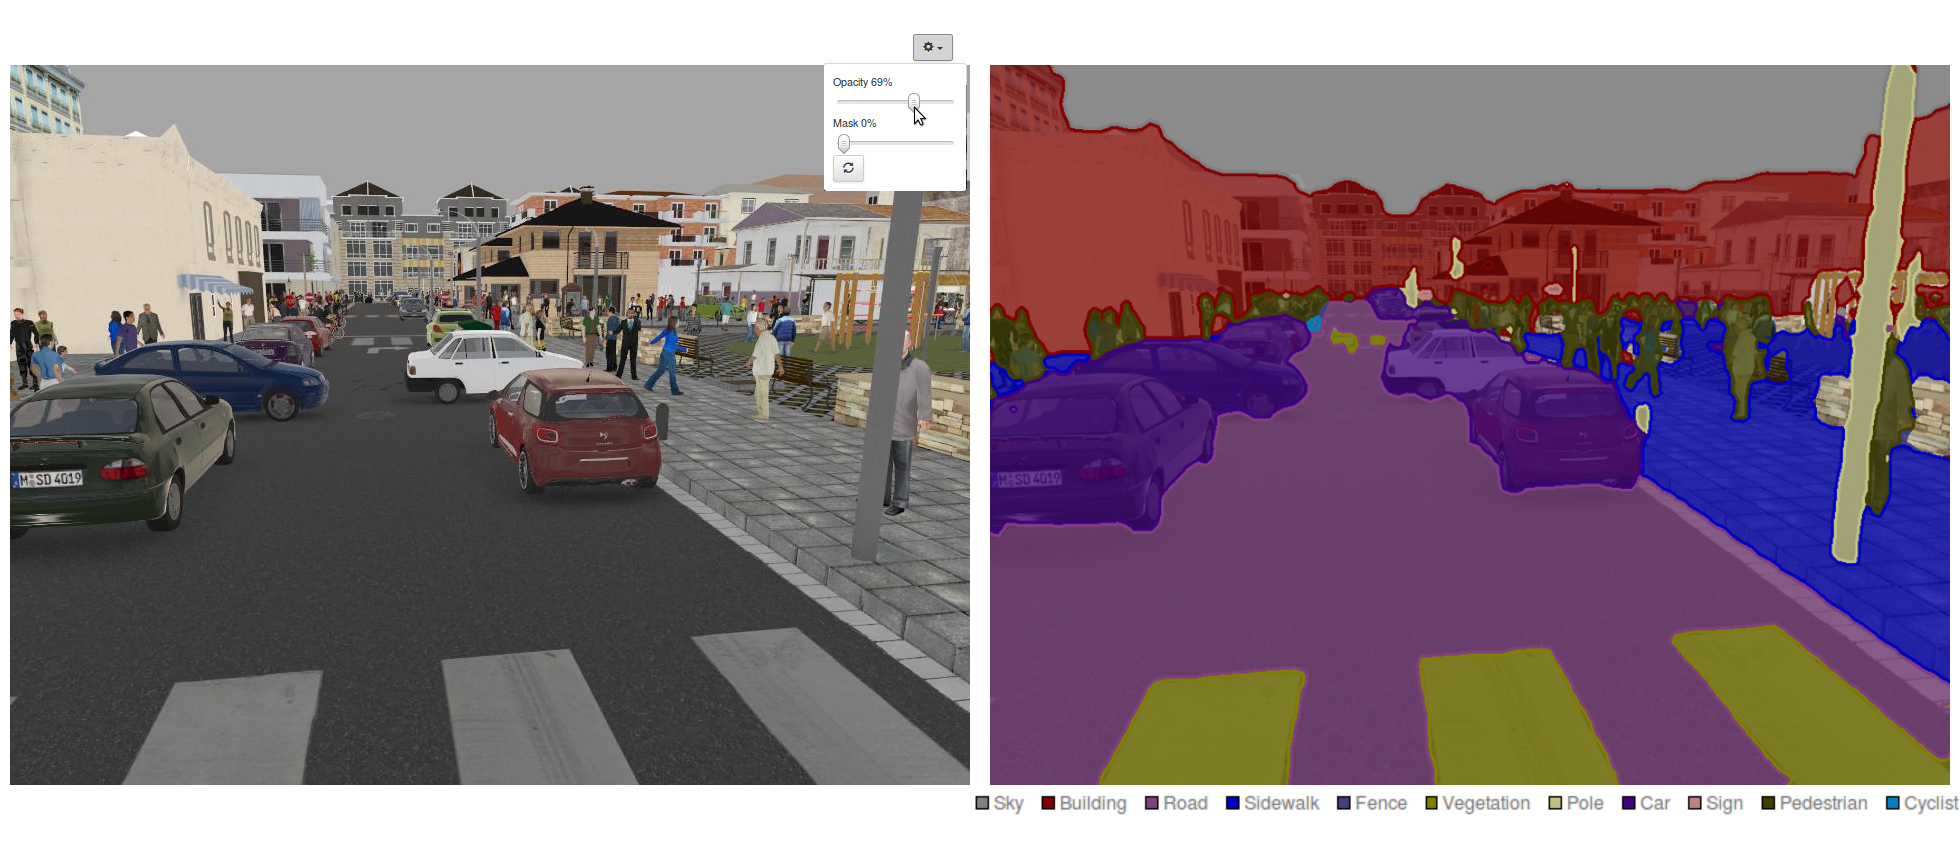 Image Segmentation Using DIGITS 5